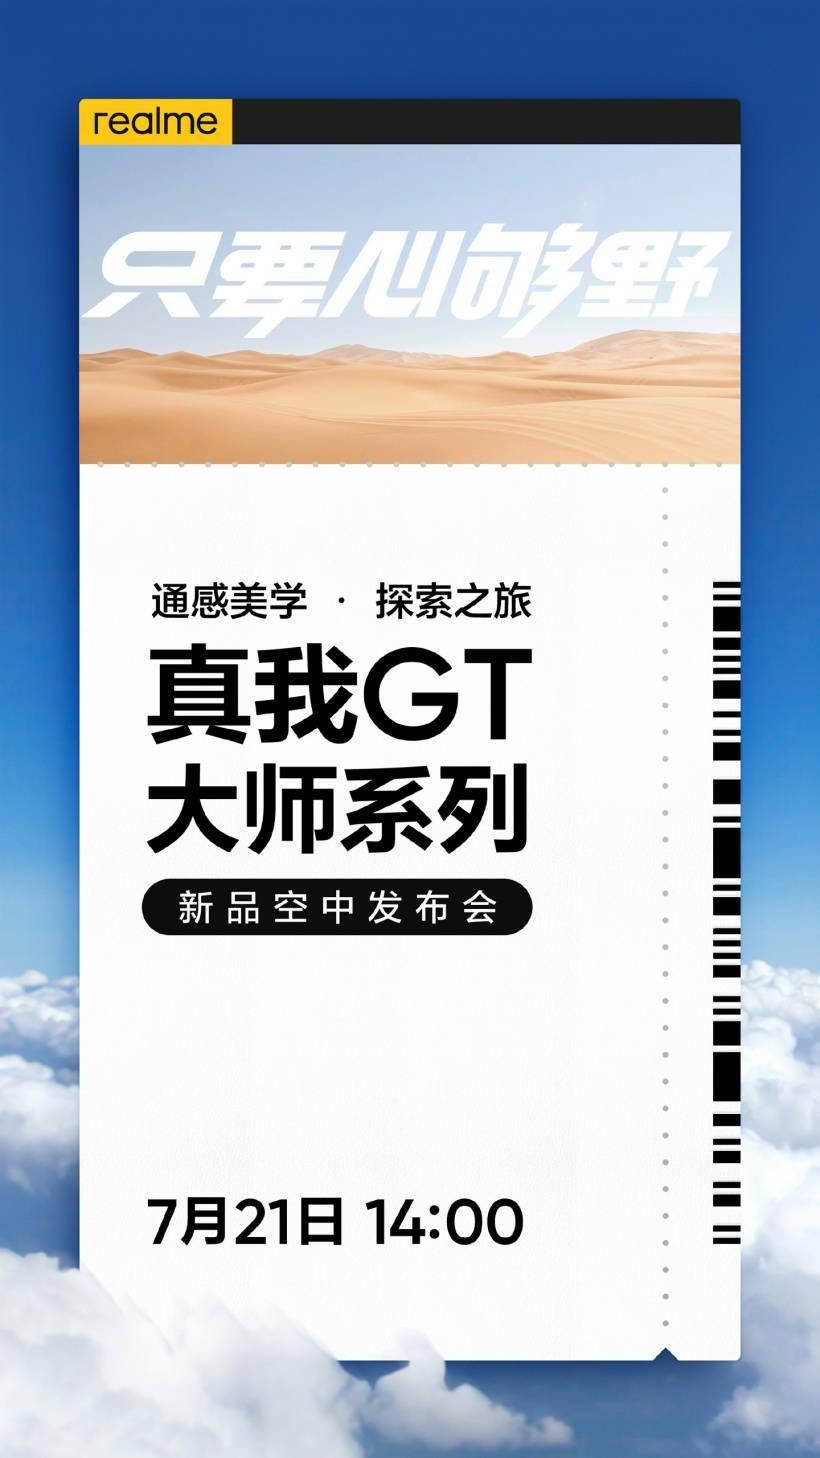 realme_真我_GT_大师系列新品空中发布会直播(视频)最新热搜榜